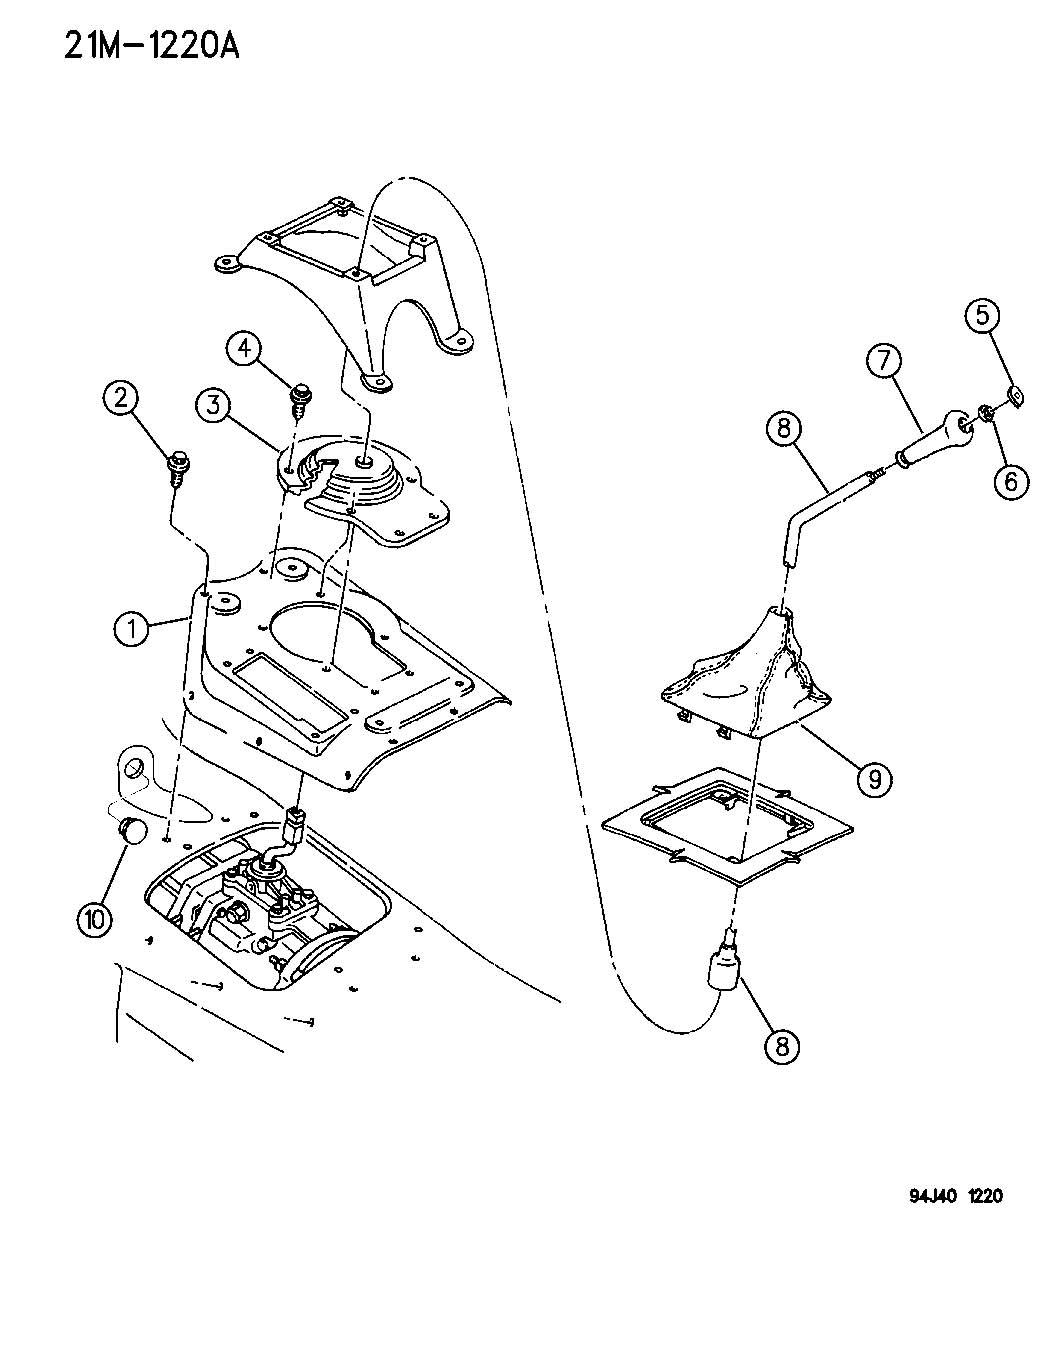 Service Manual Remove Jeep Grand Cherokee Floor Shift Lever